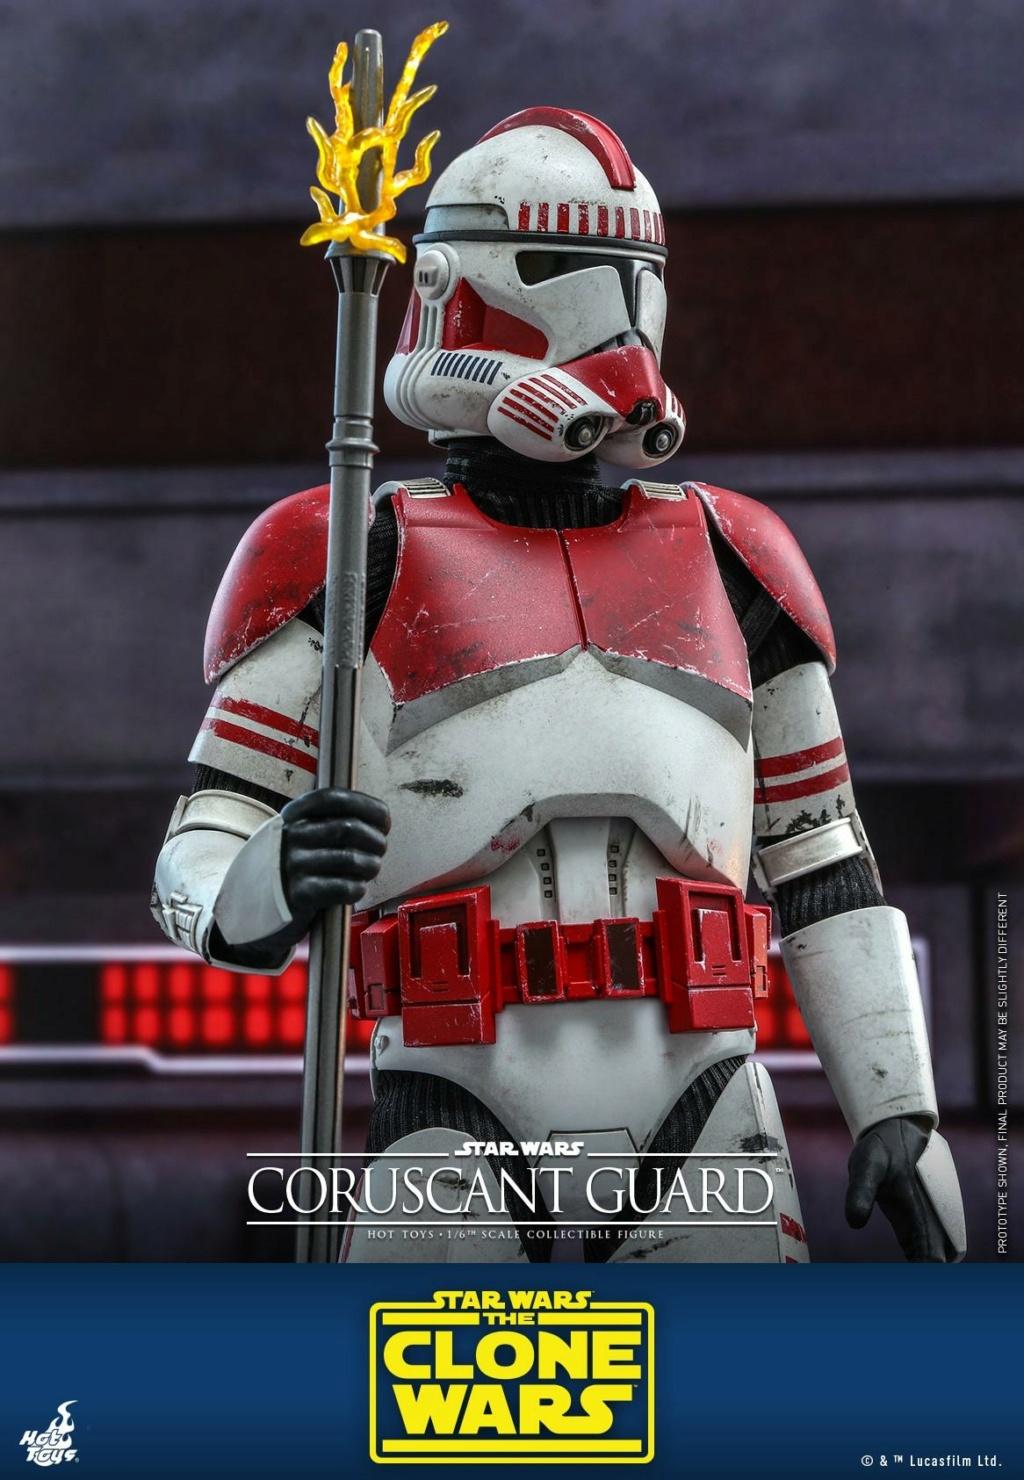 Coruscant Guard - 1/6th Figure - The Clone Wars - Hot Toys Corusc17